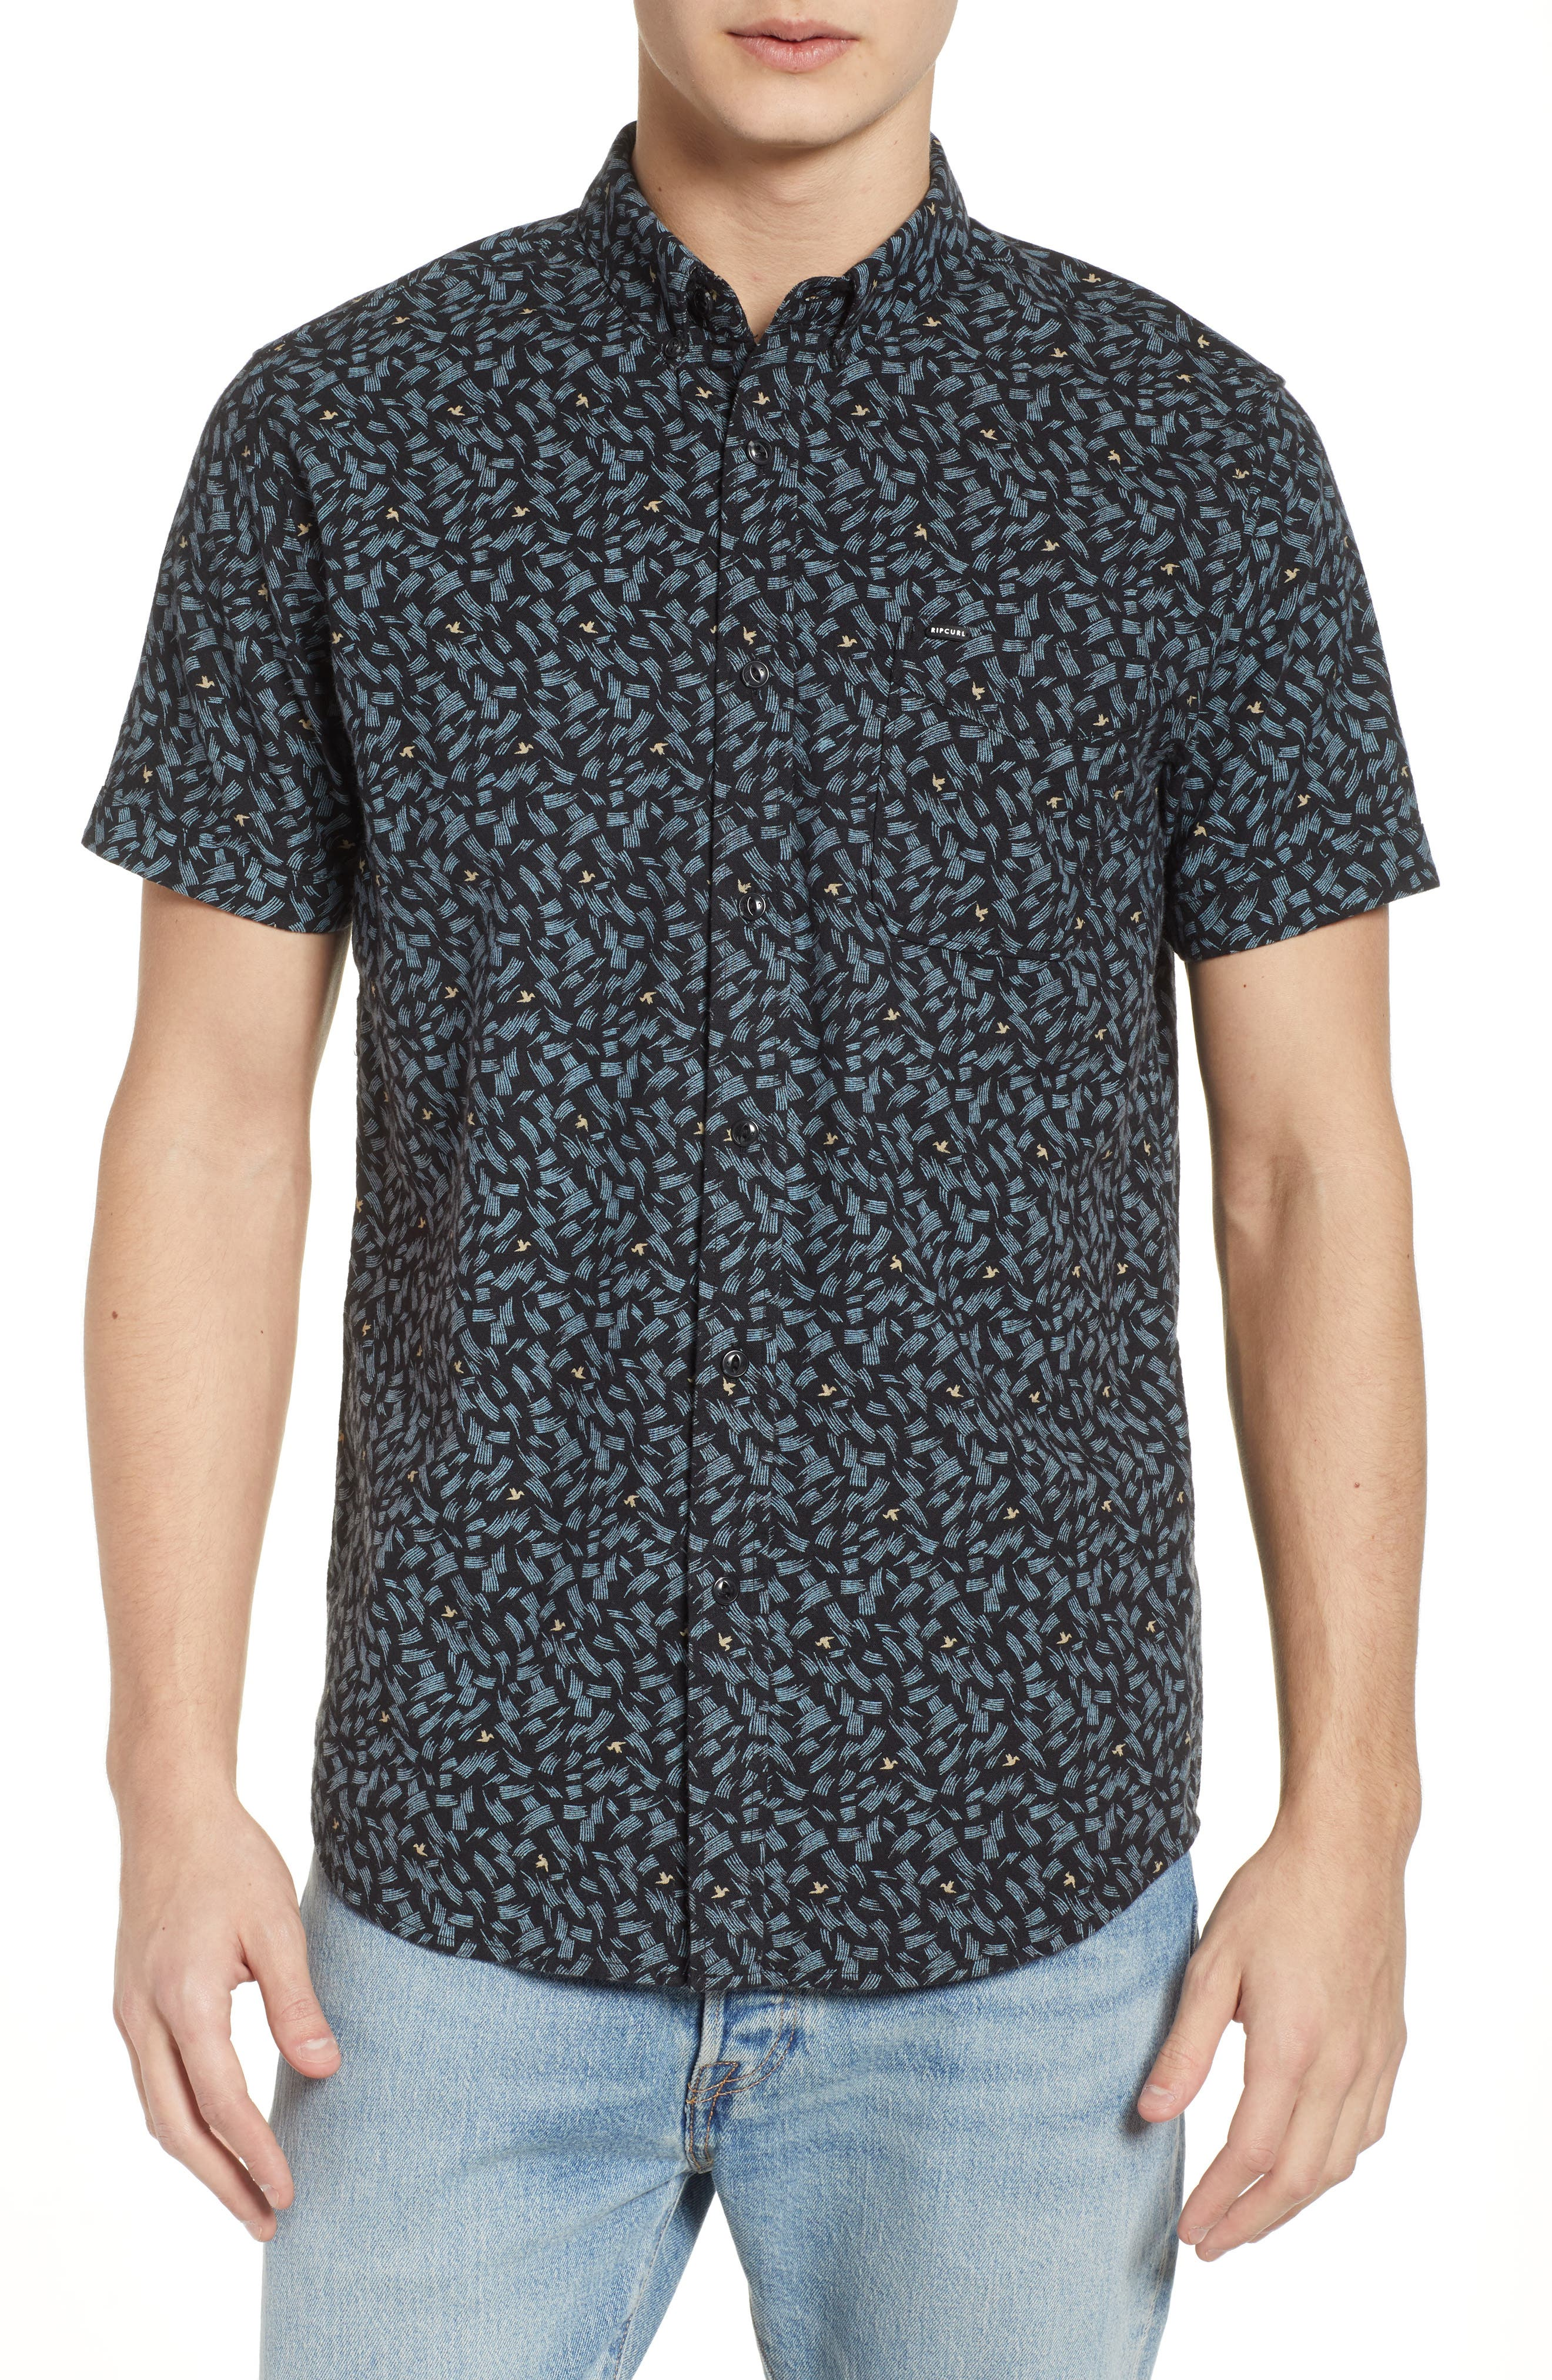 Northern Short Sleeve Shirt,                         Main,                         color, 001